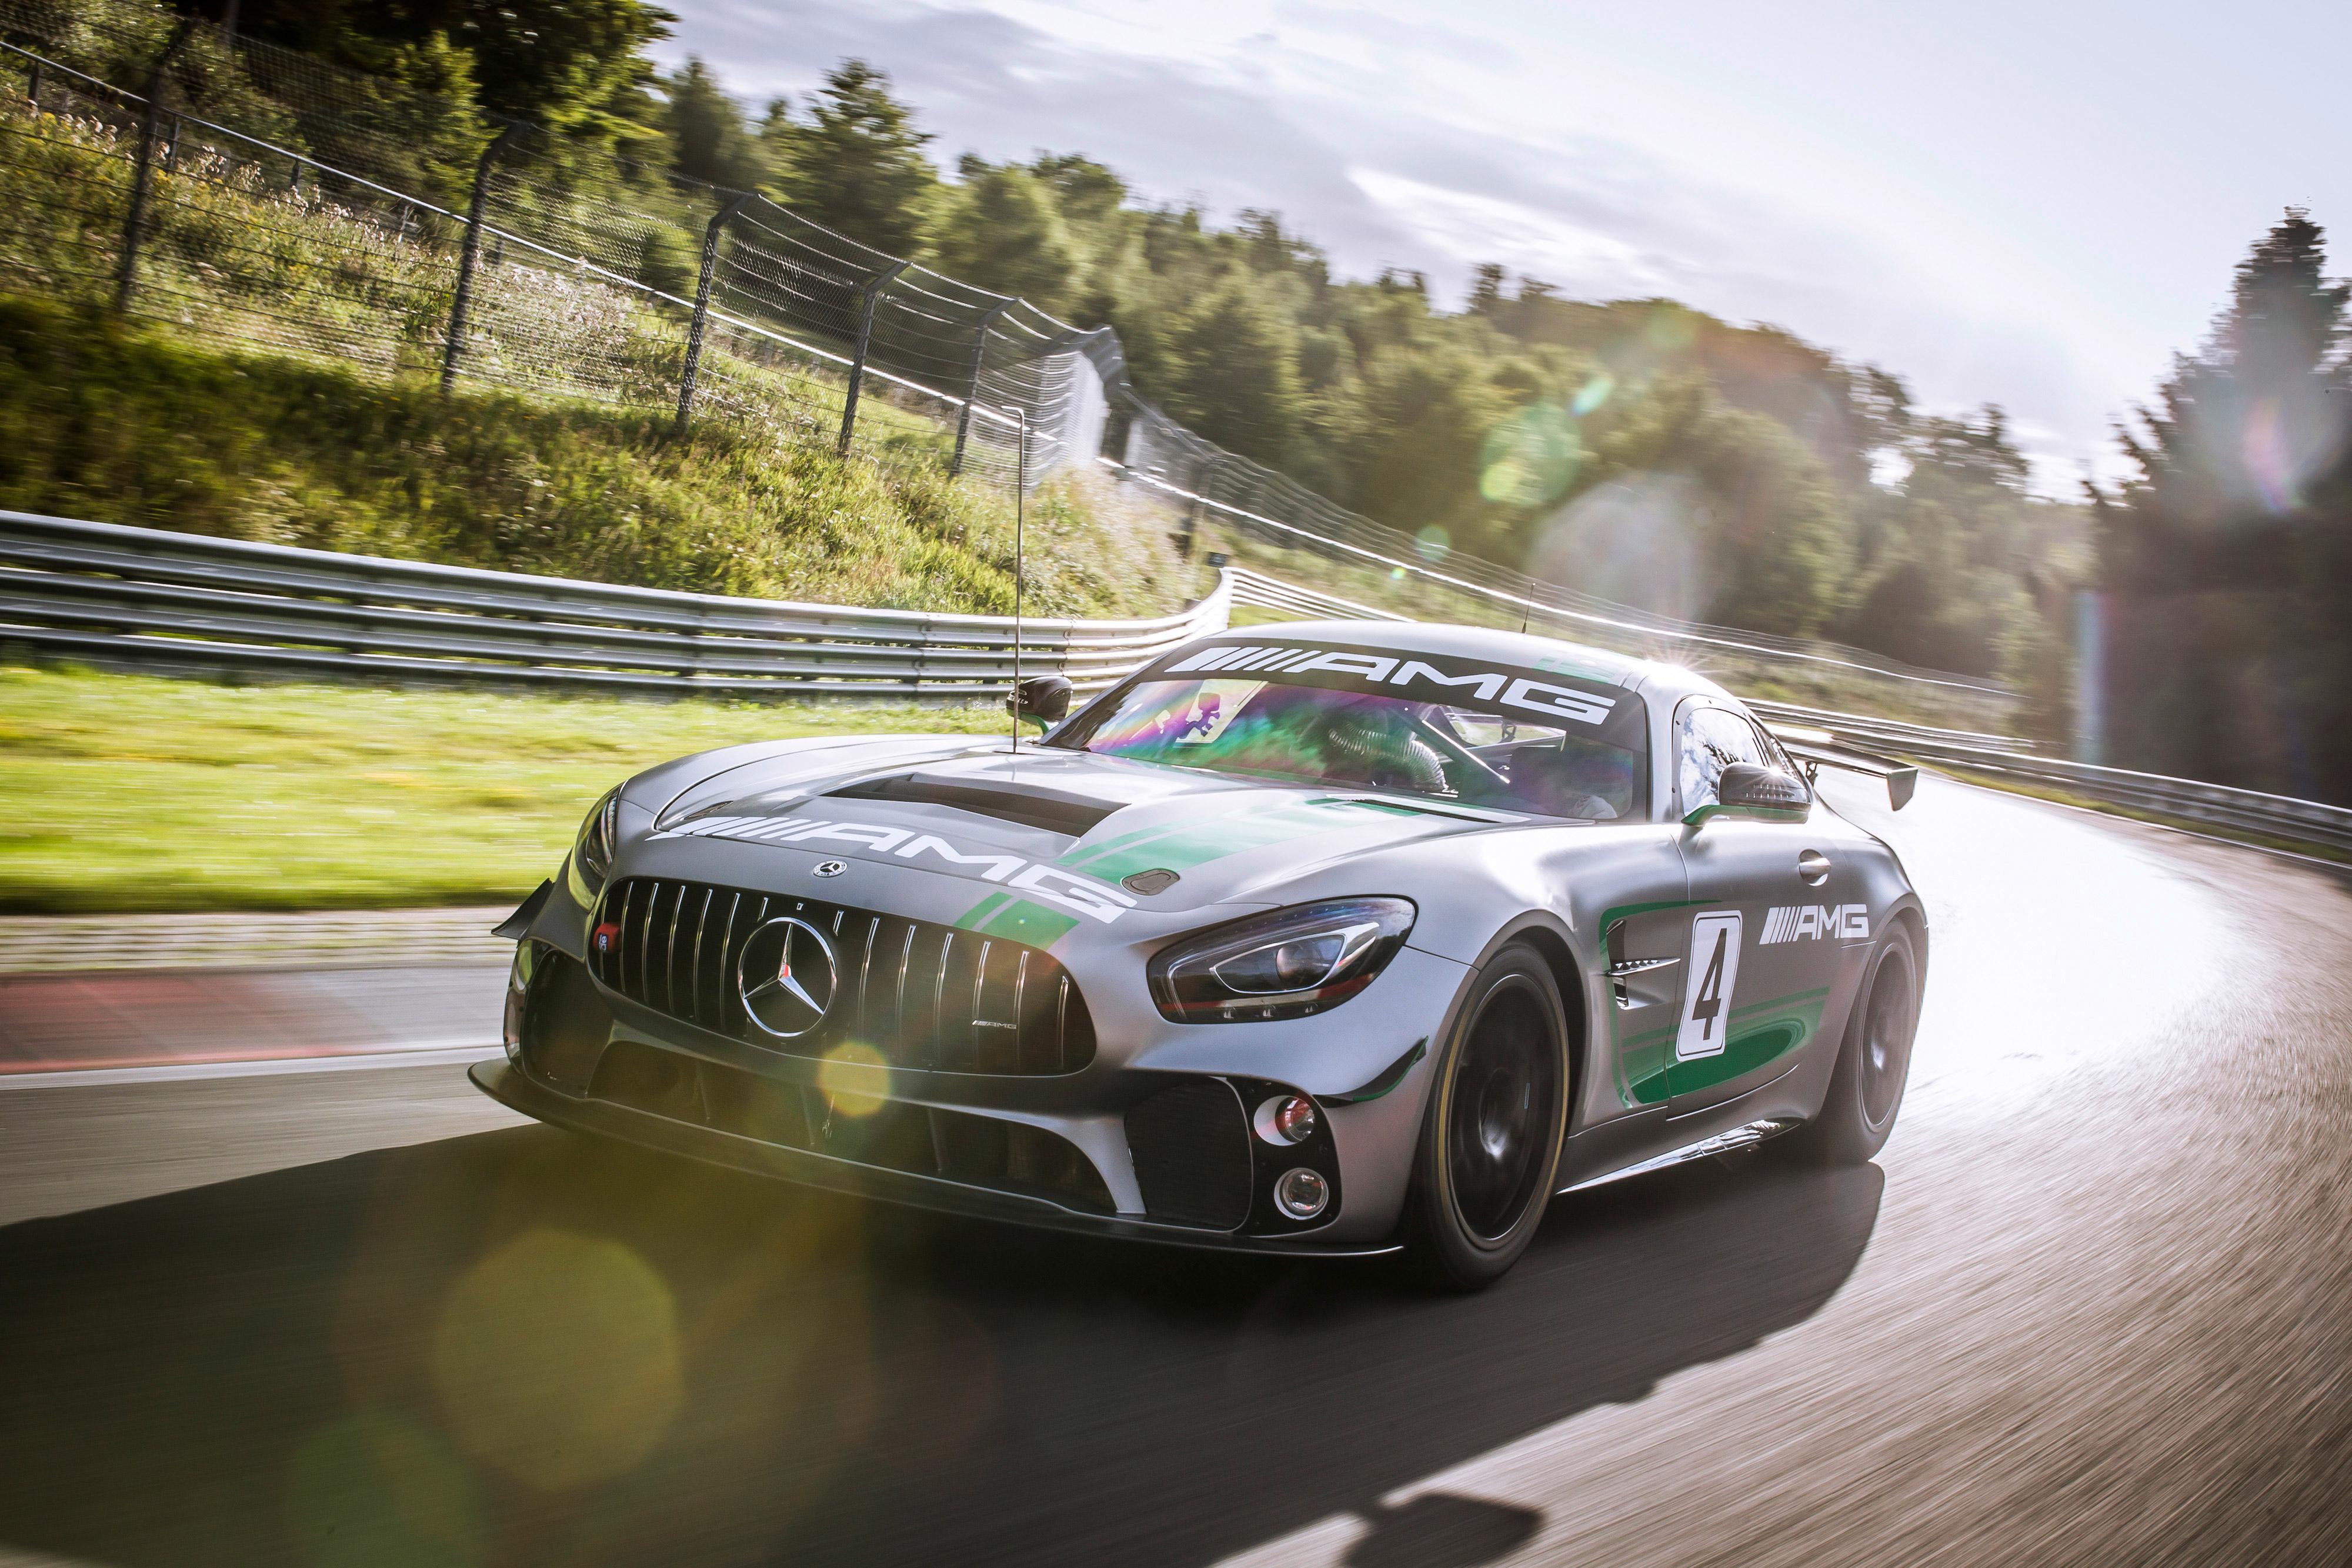 2017 Mercedes AMG GT4 C190 4k, HD Cars, 4k Wallpapers ...